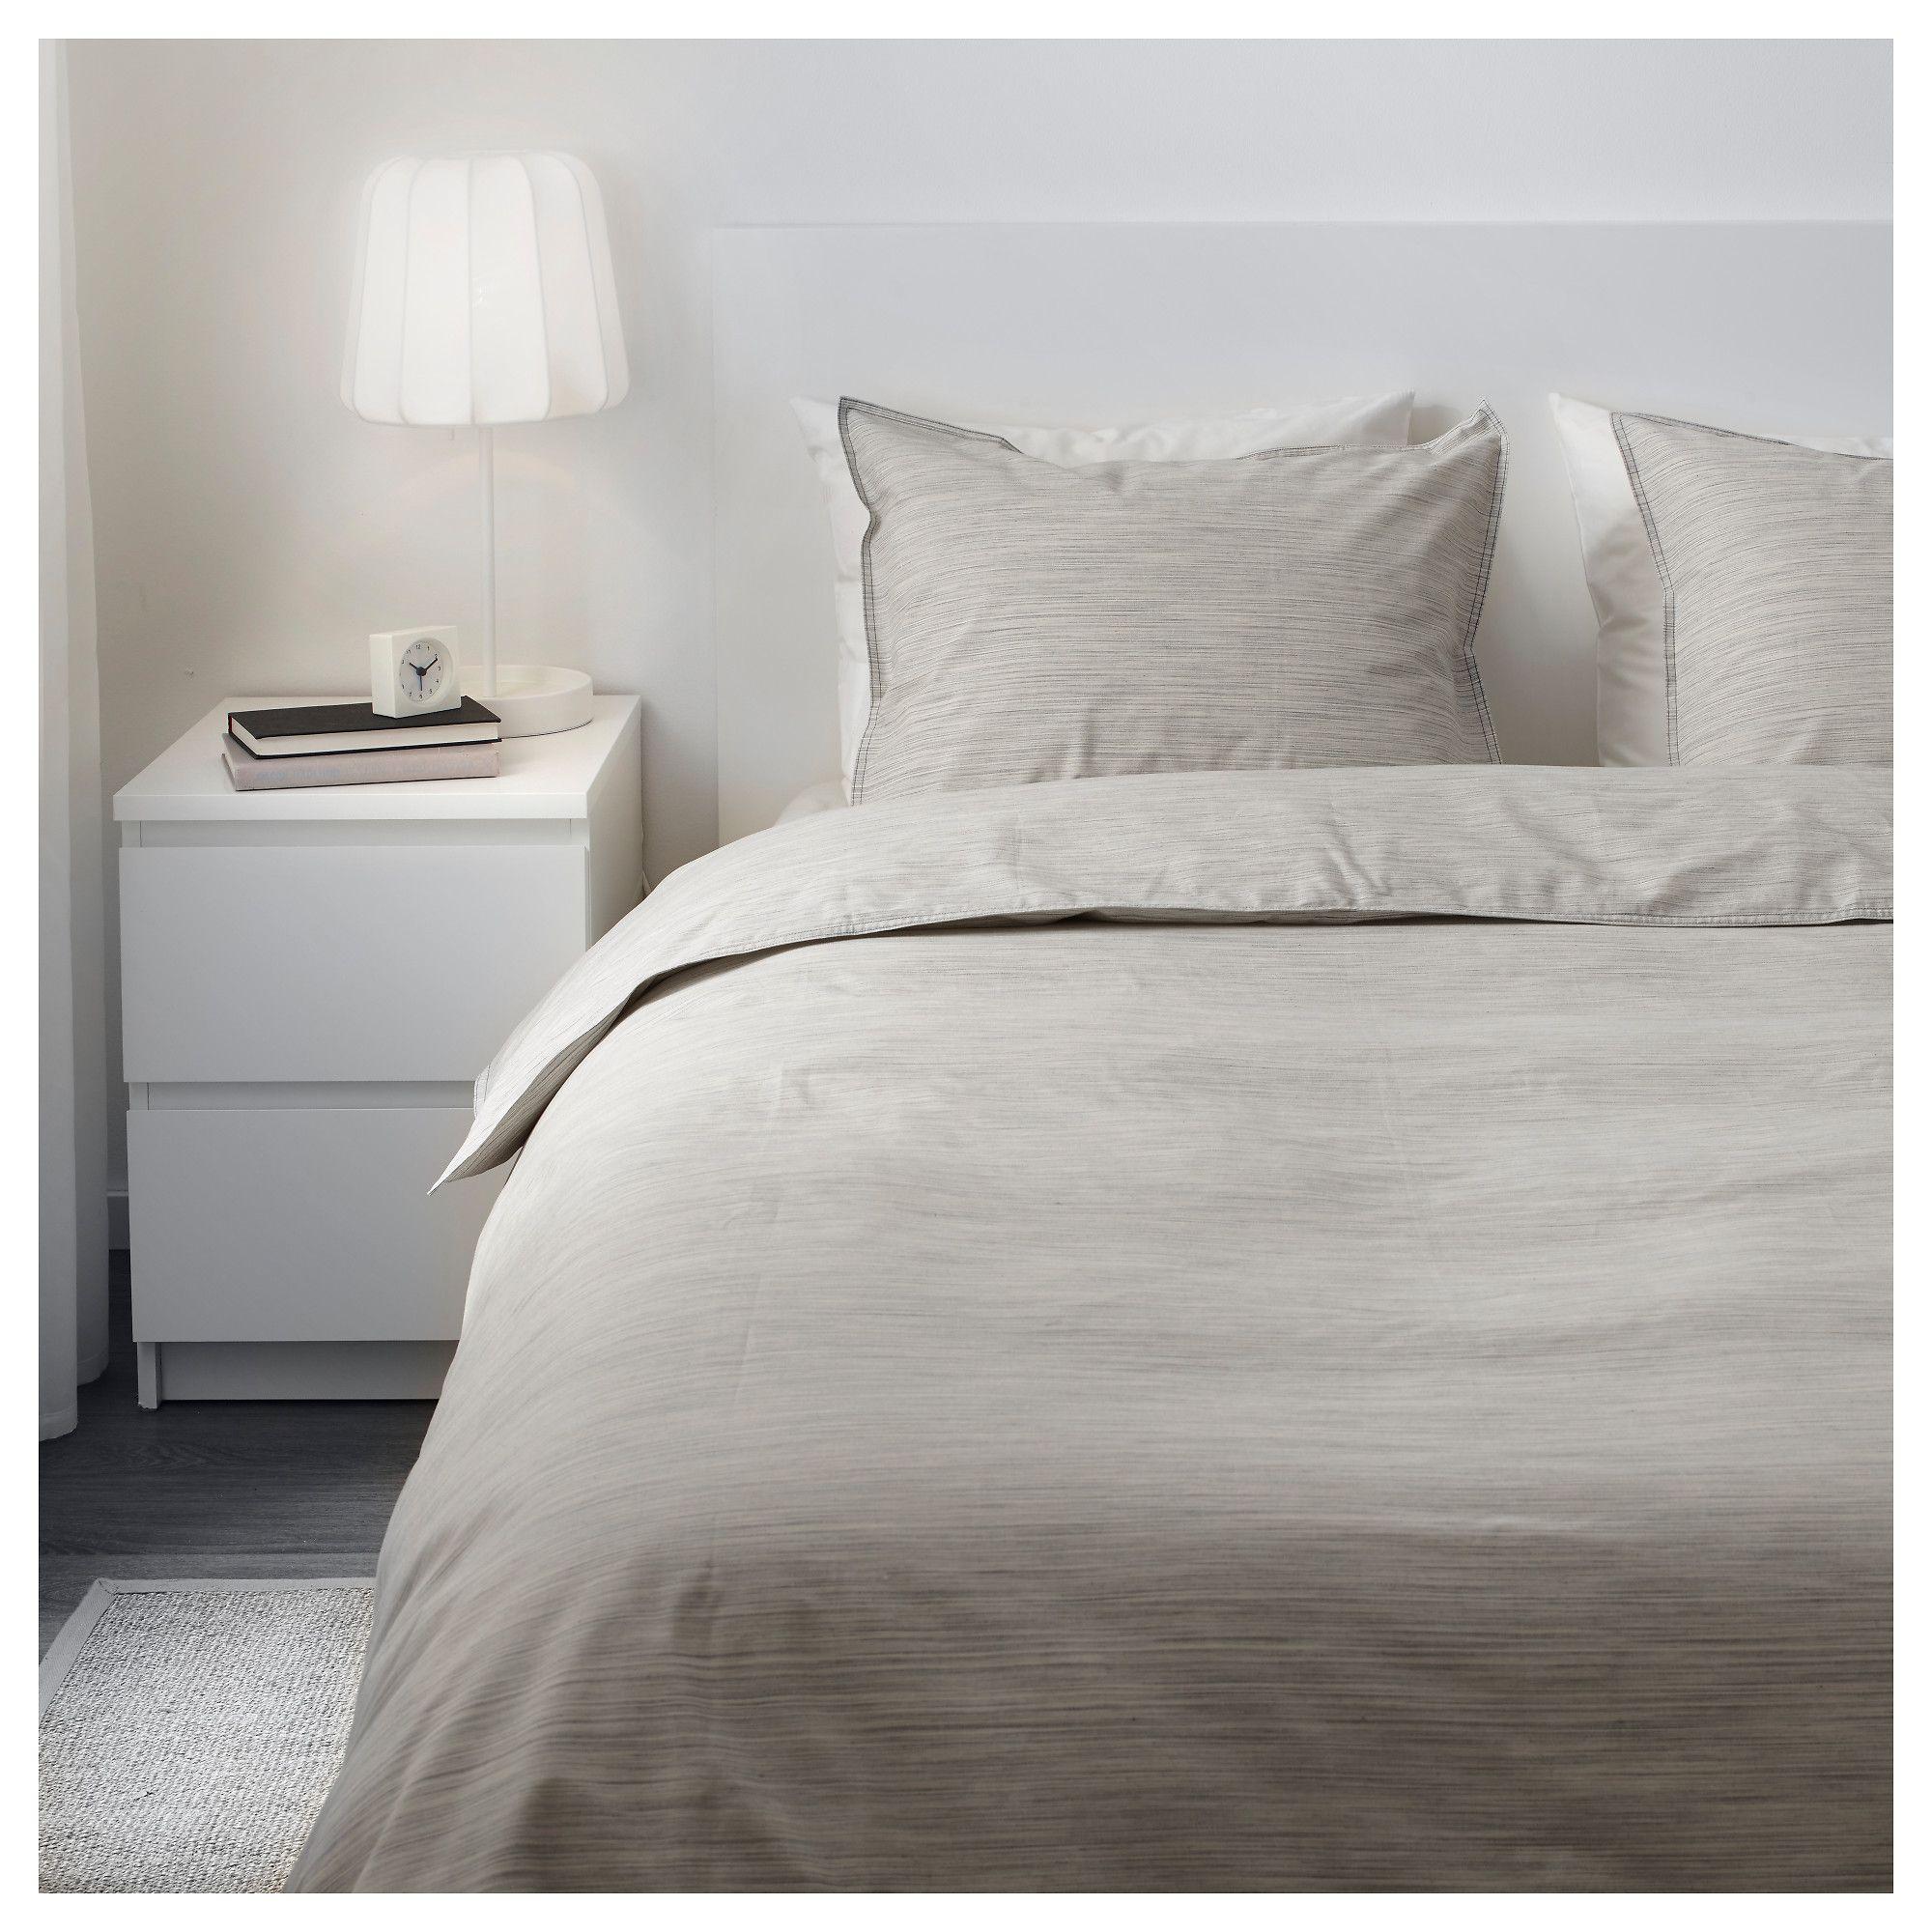 Ikea Skogsalm Beige Duvet Cover And Pillowcase S Beige Duvet